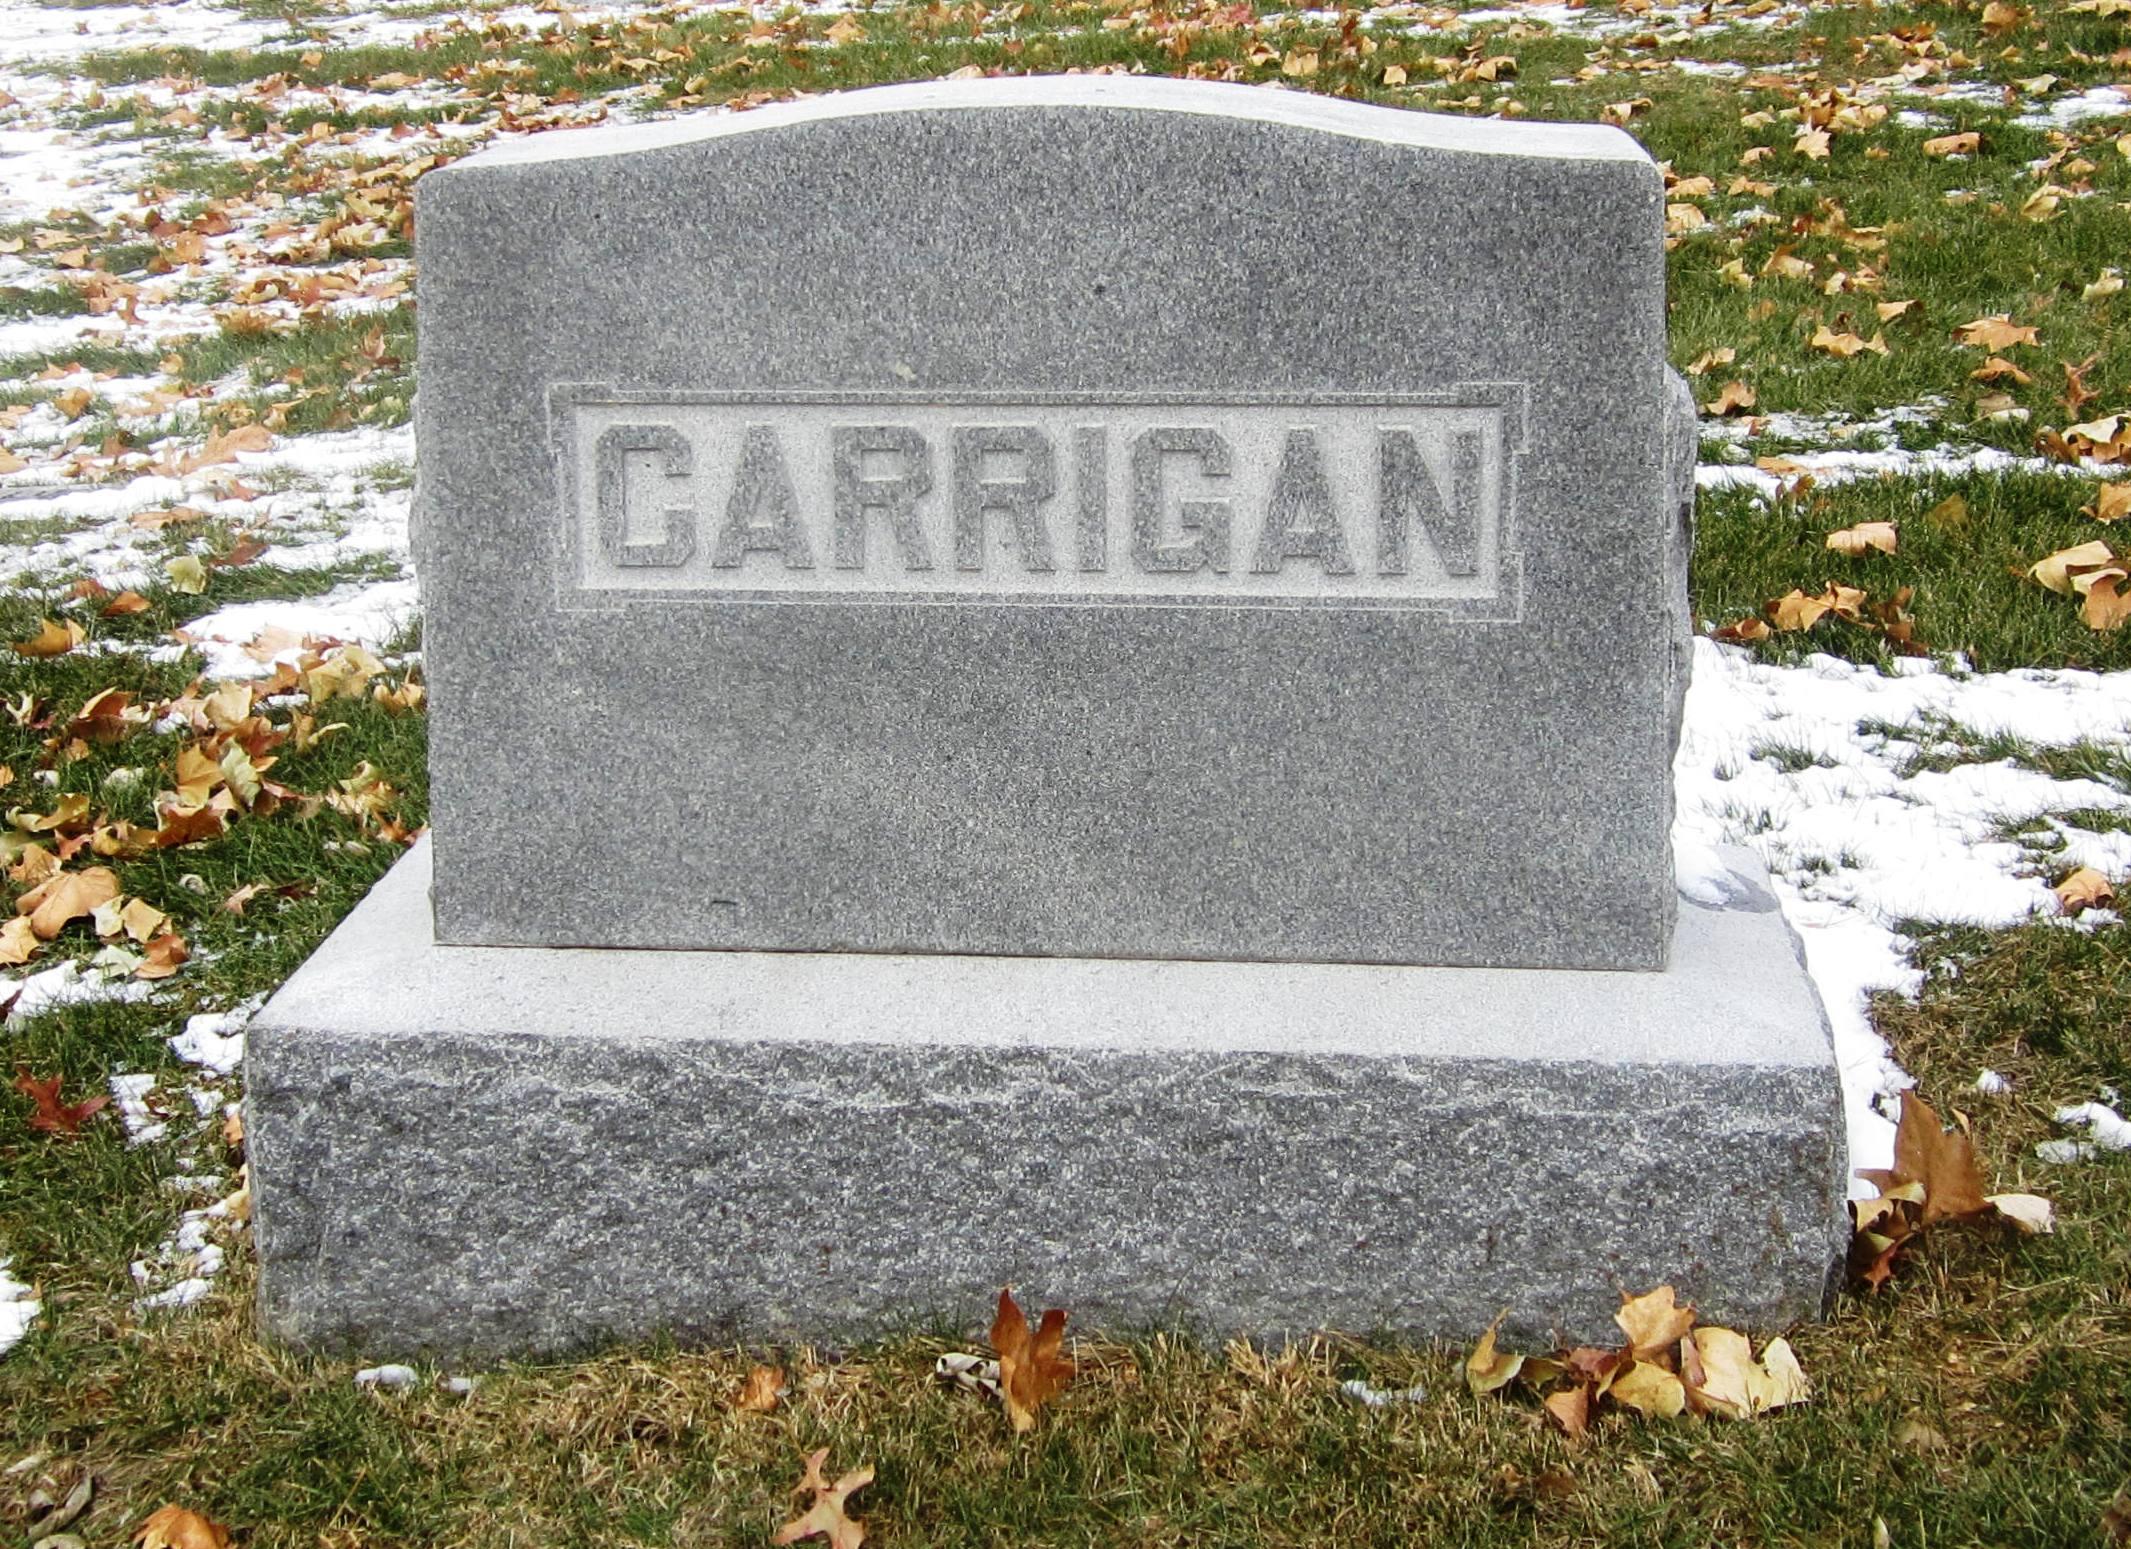 Edmond Bernard Carrigan